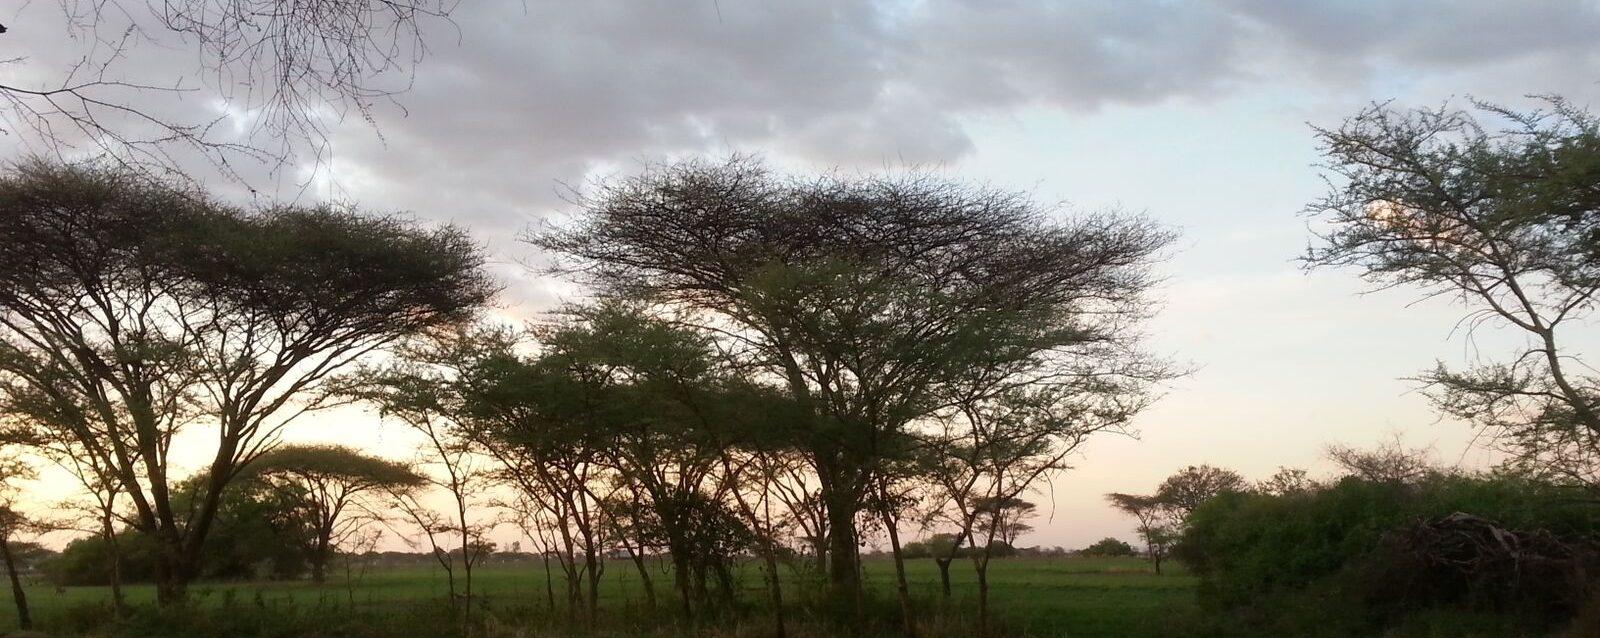 The Mara Project